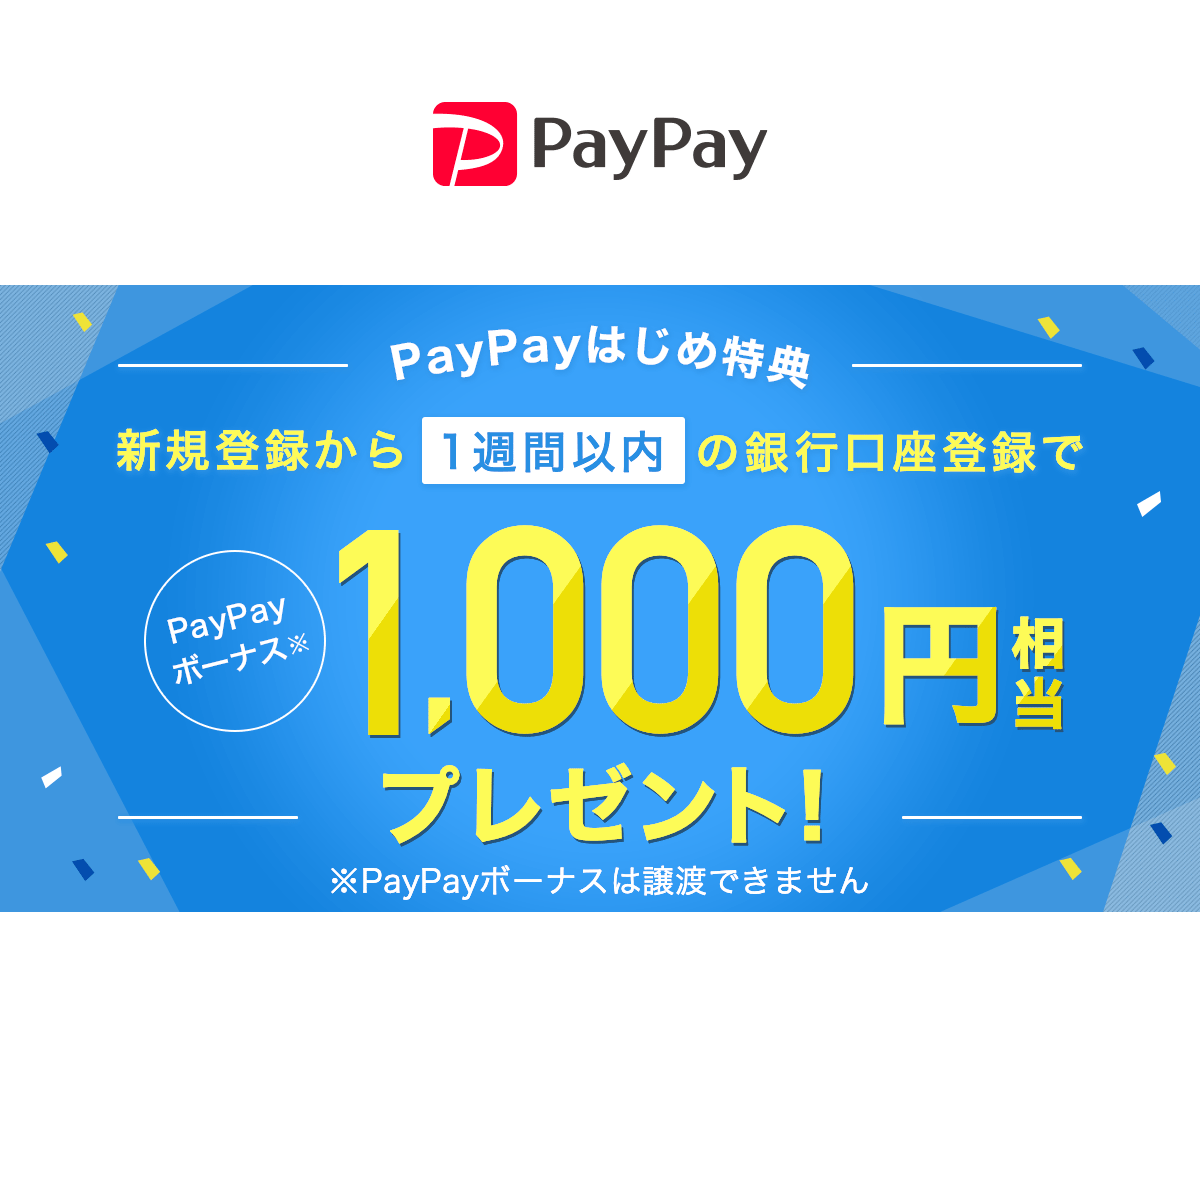 https://image.paypay.ne.jp/page/event/bank-regist-20190801/images/img_ogp_01.png